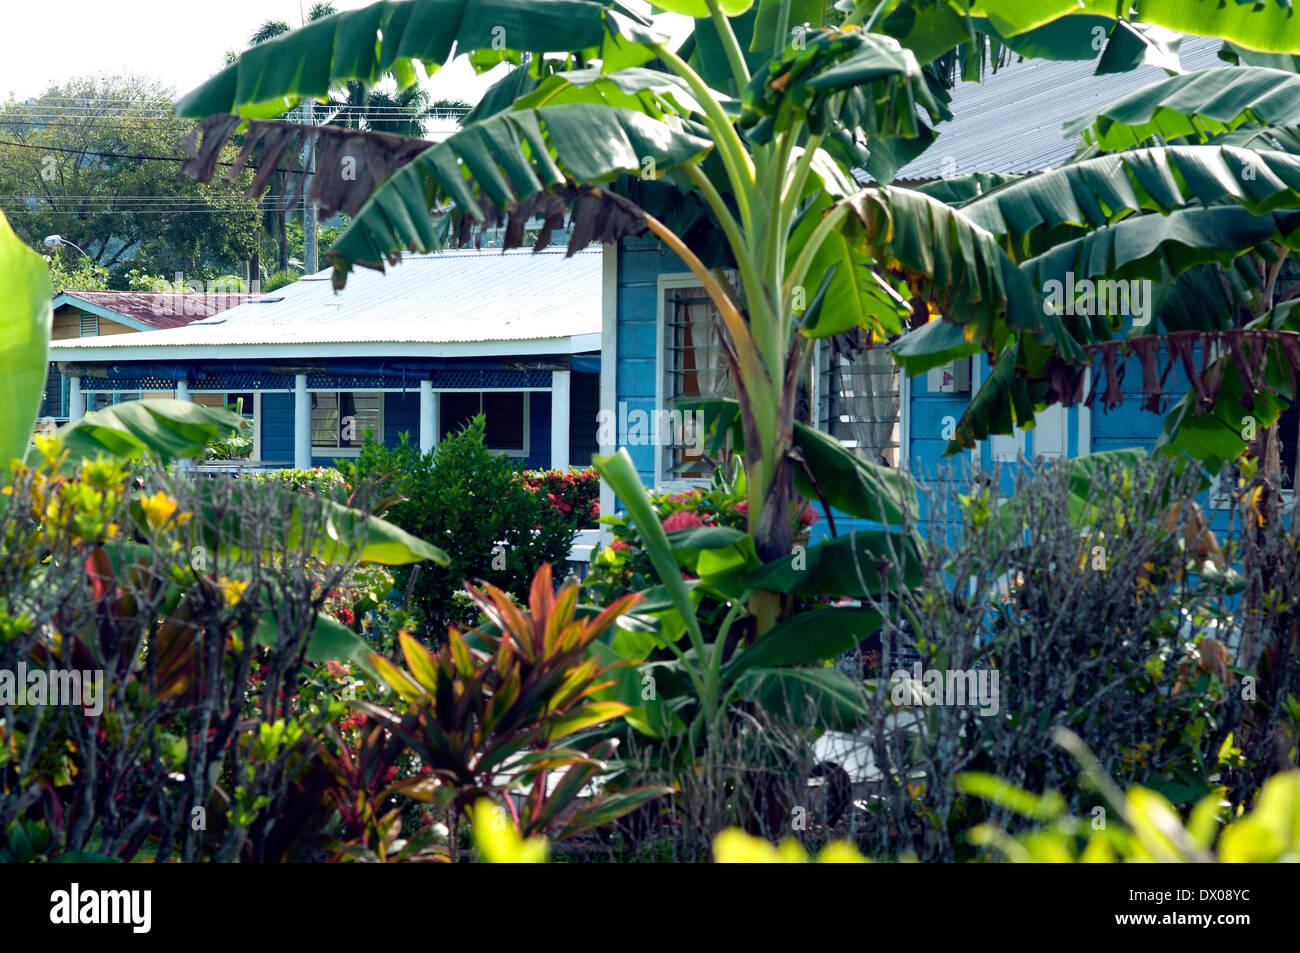 village house, Apia, Samoa - Stock Image